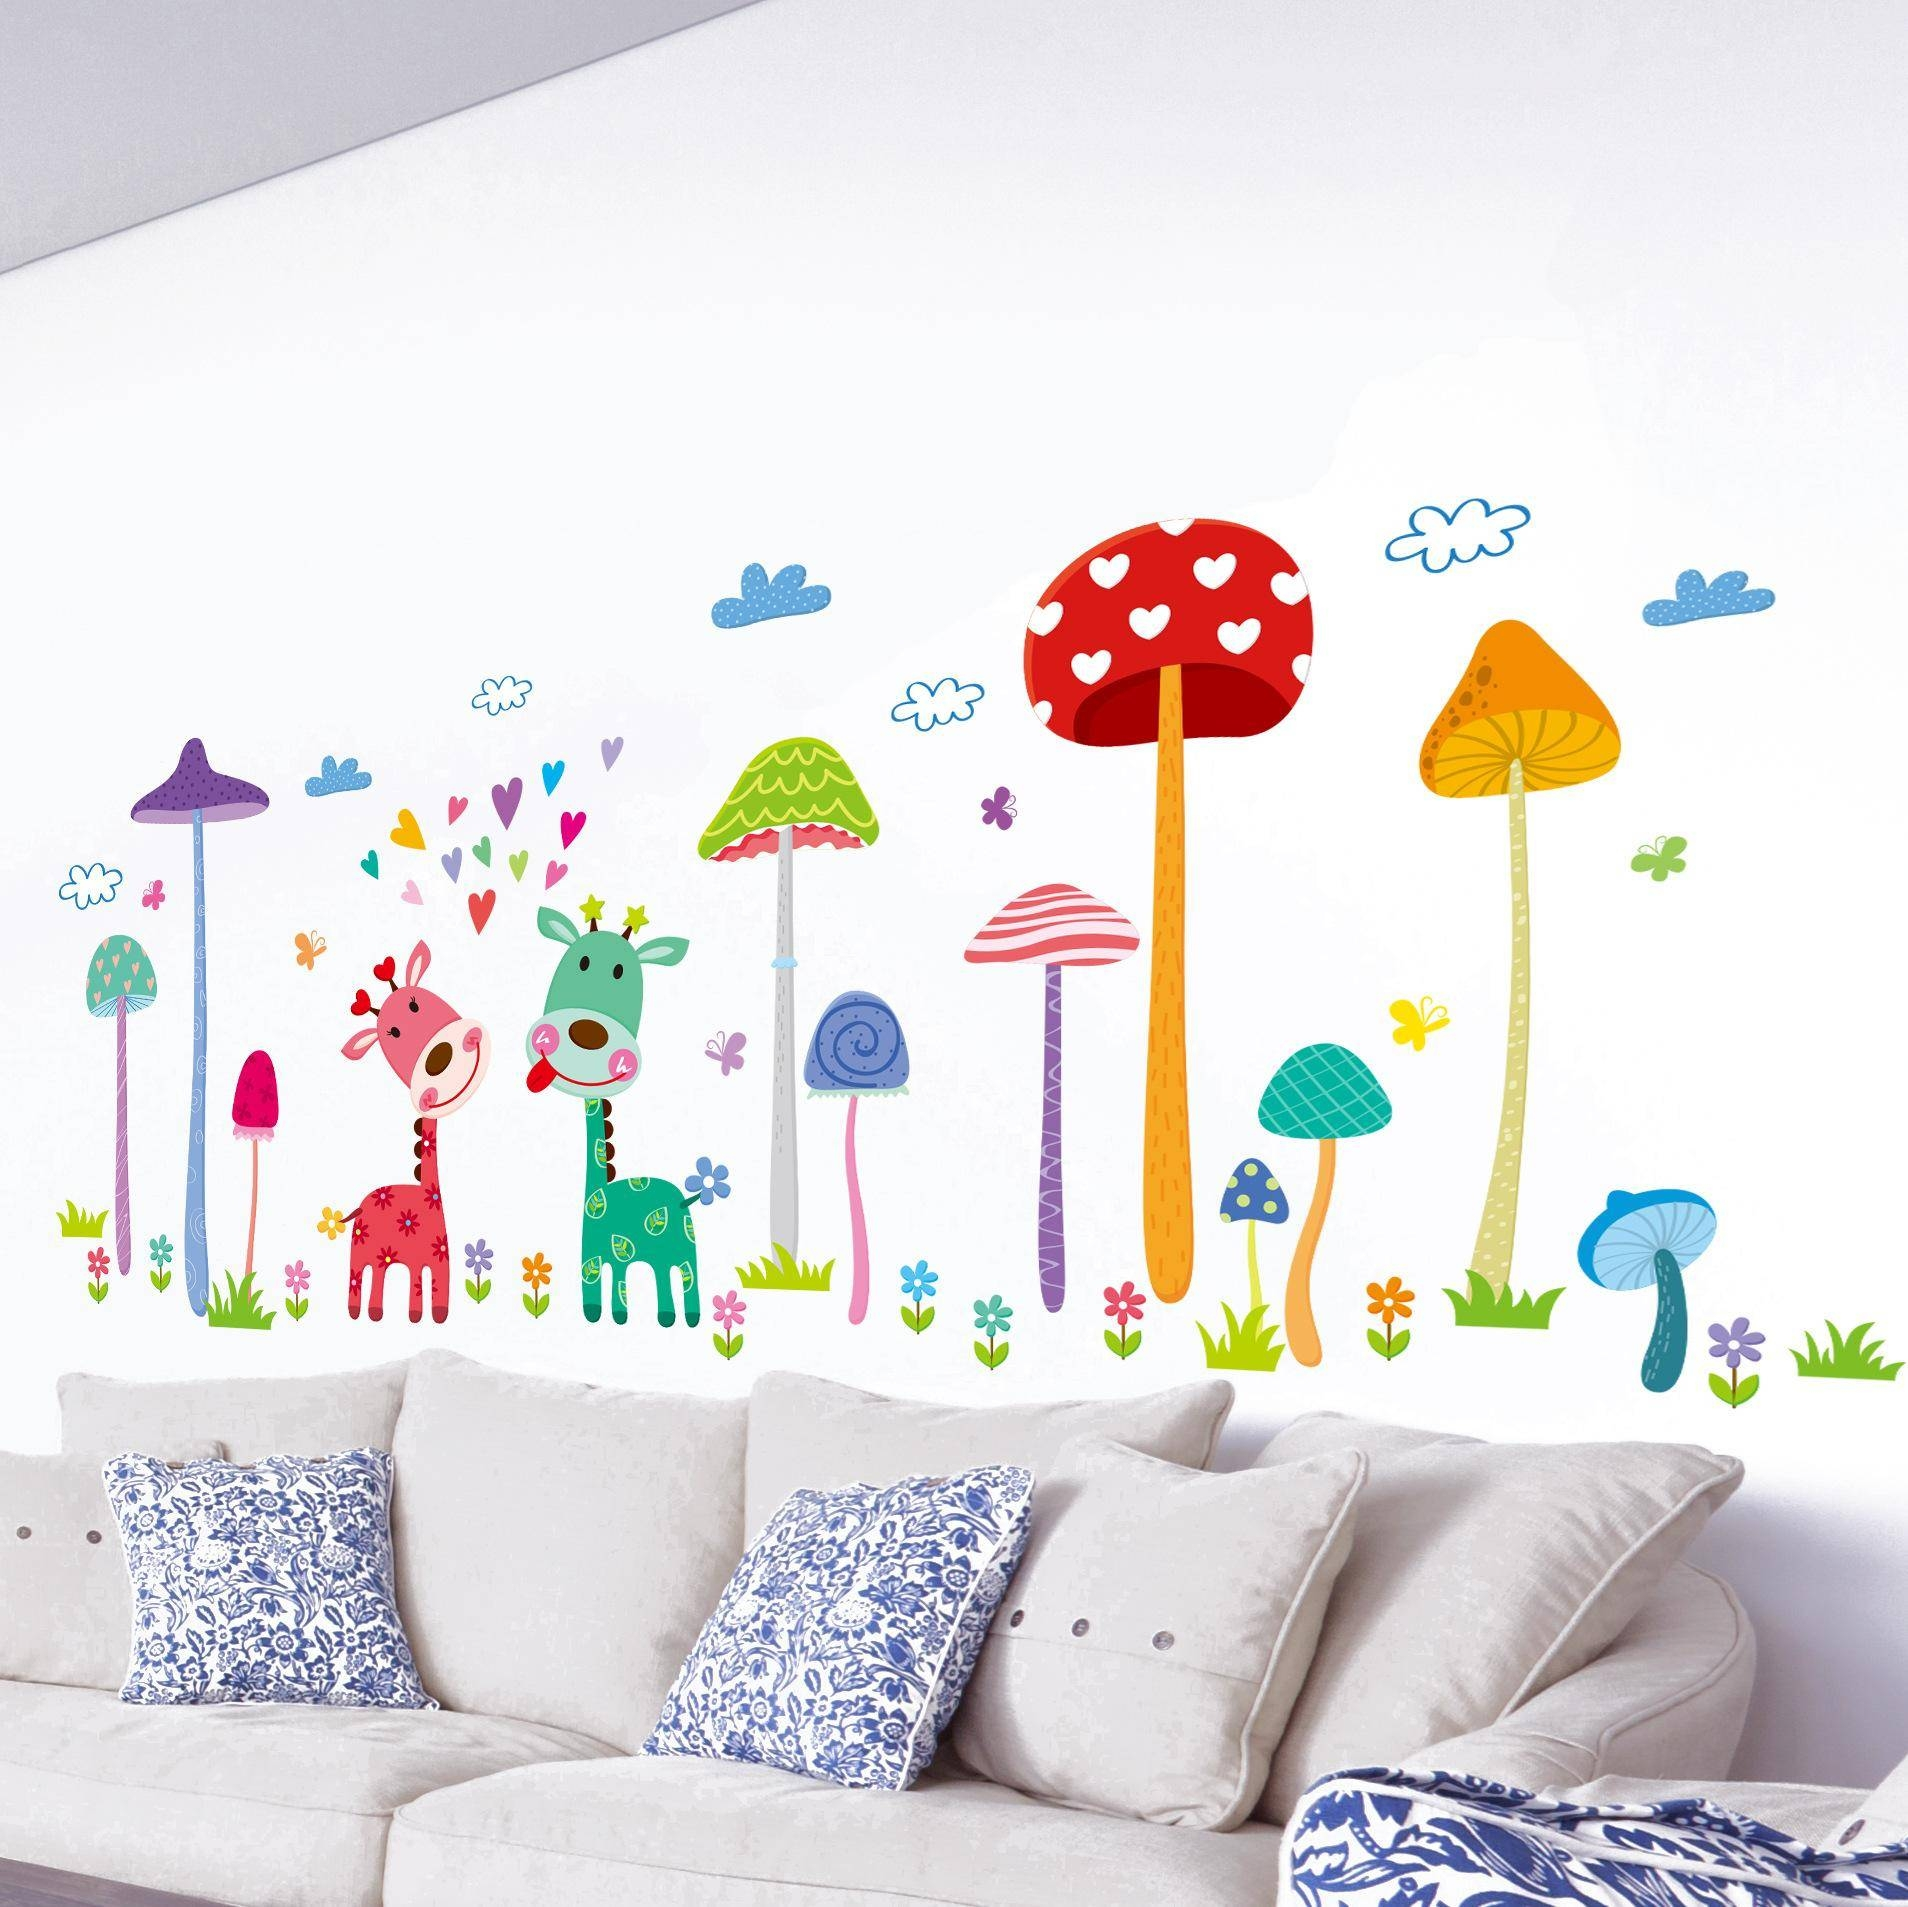 Forest Mushroom Deer Home Wall Art Mural Decor Kids Babies Room Within 2018 Children Wall Art (View 8 of 15)